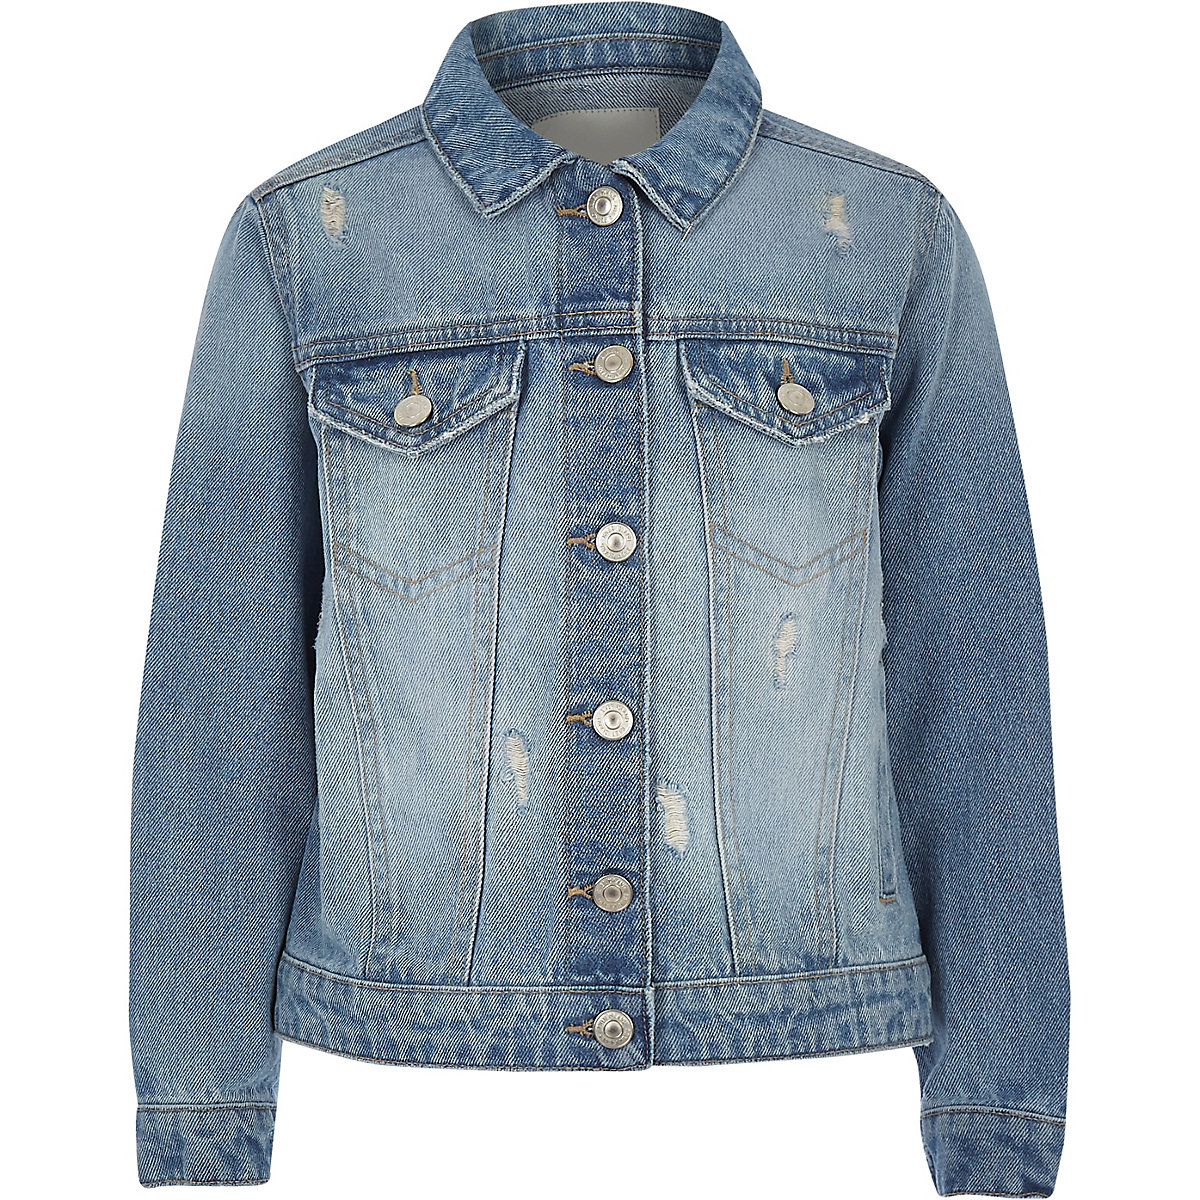 Girls blue distressed denim jacket